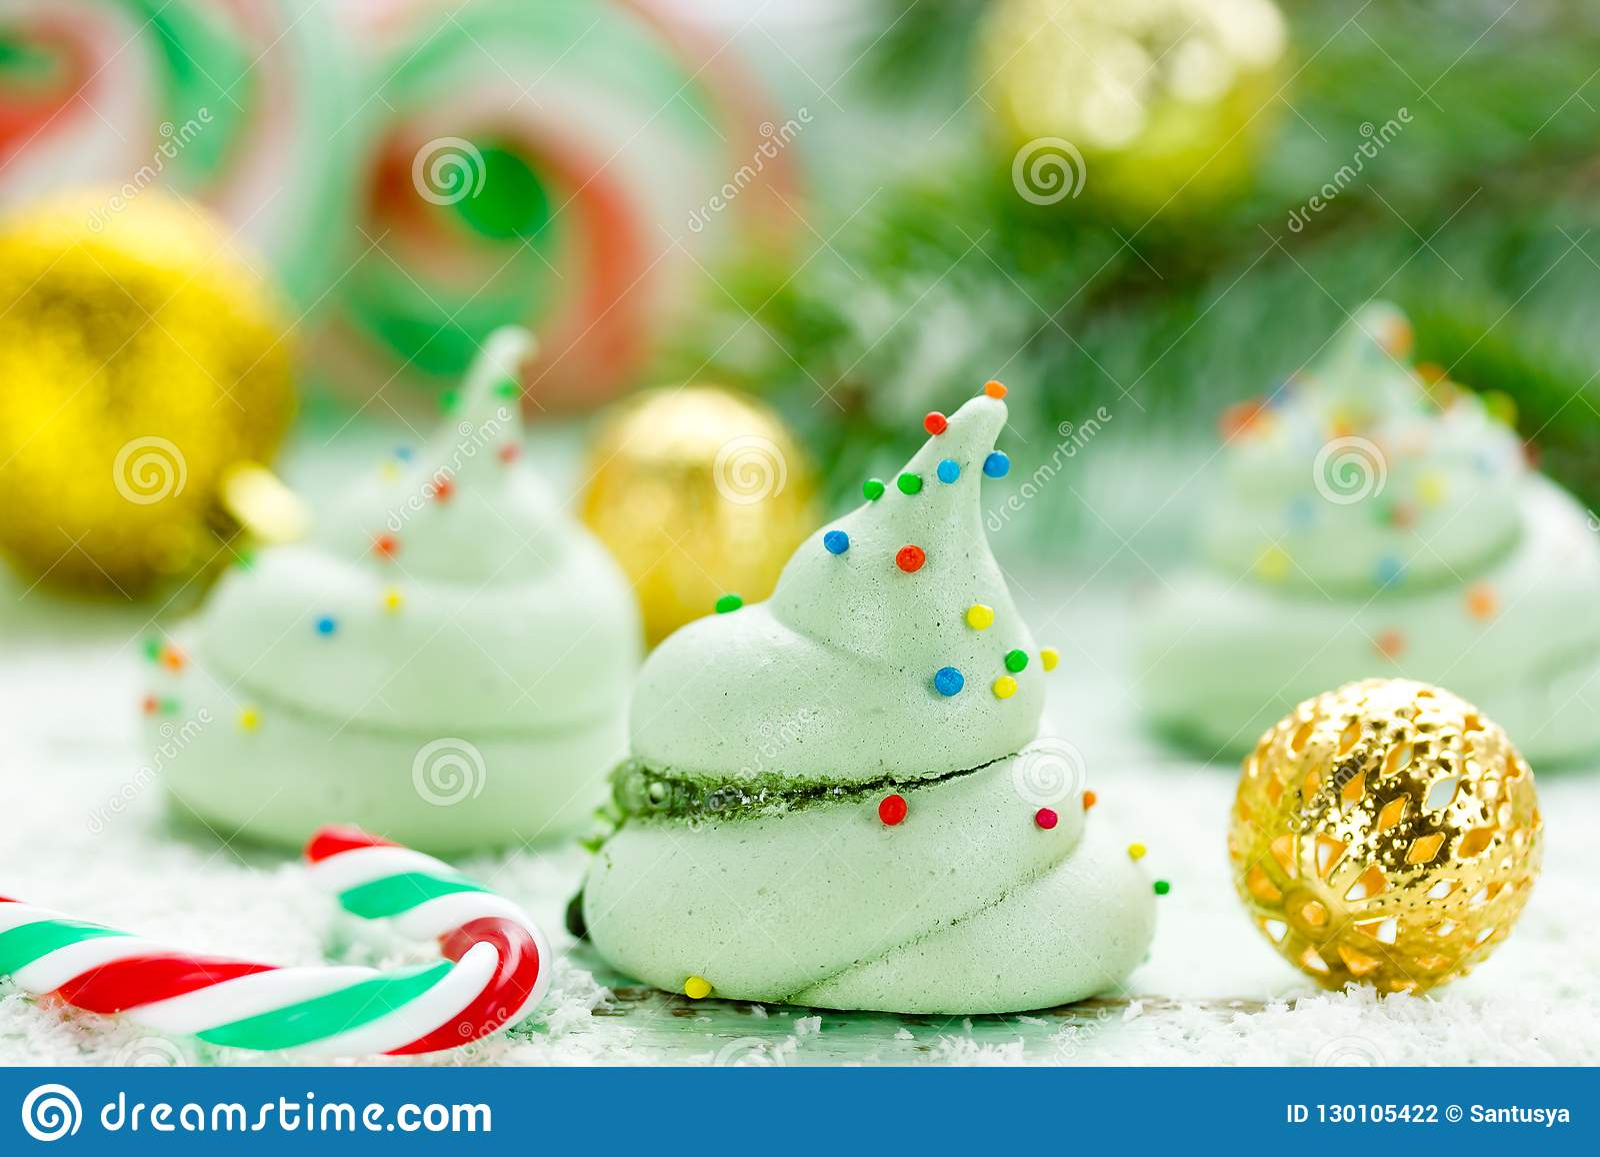 Christmas Tree Meringue.Christmas Tree Meringue Homemade Green Meringues Stock